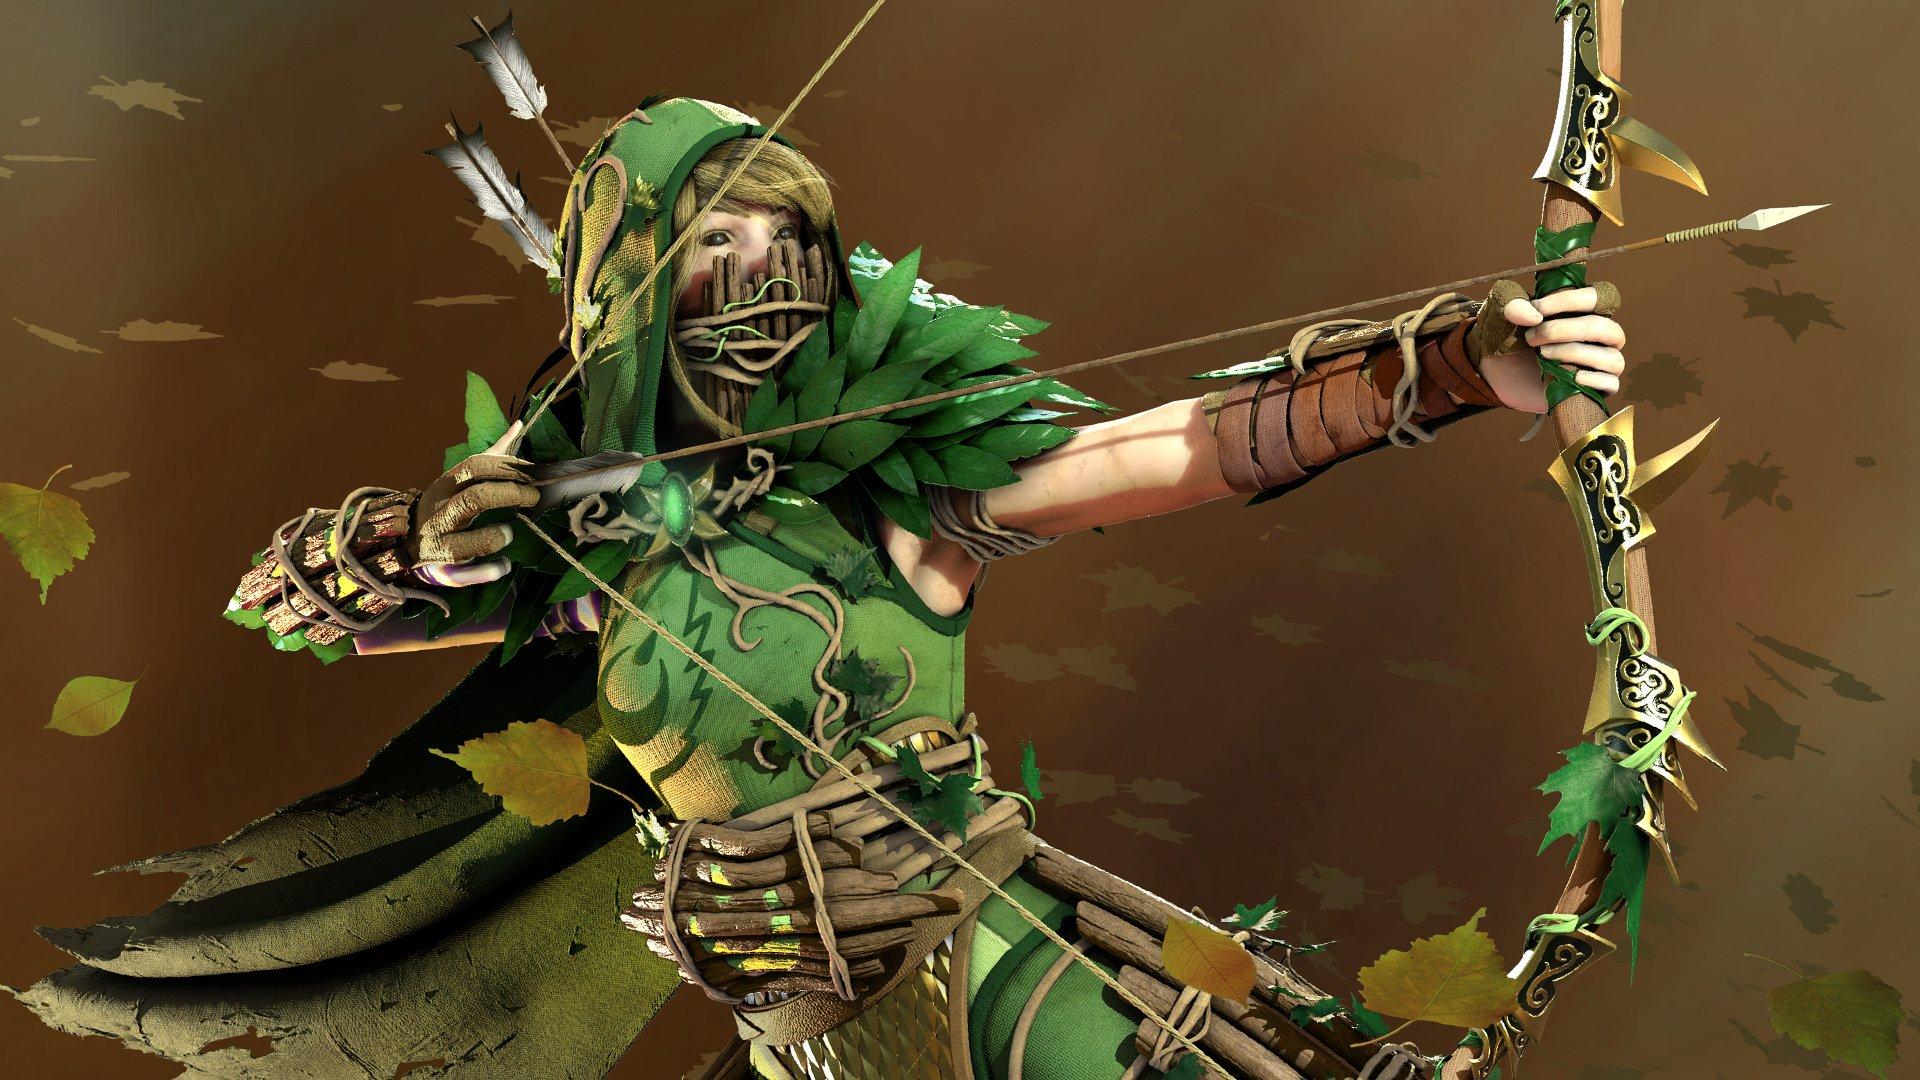 Warhammer: Chaosbanes Wood Elf is an arrow-spitting